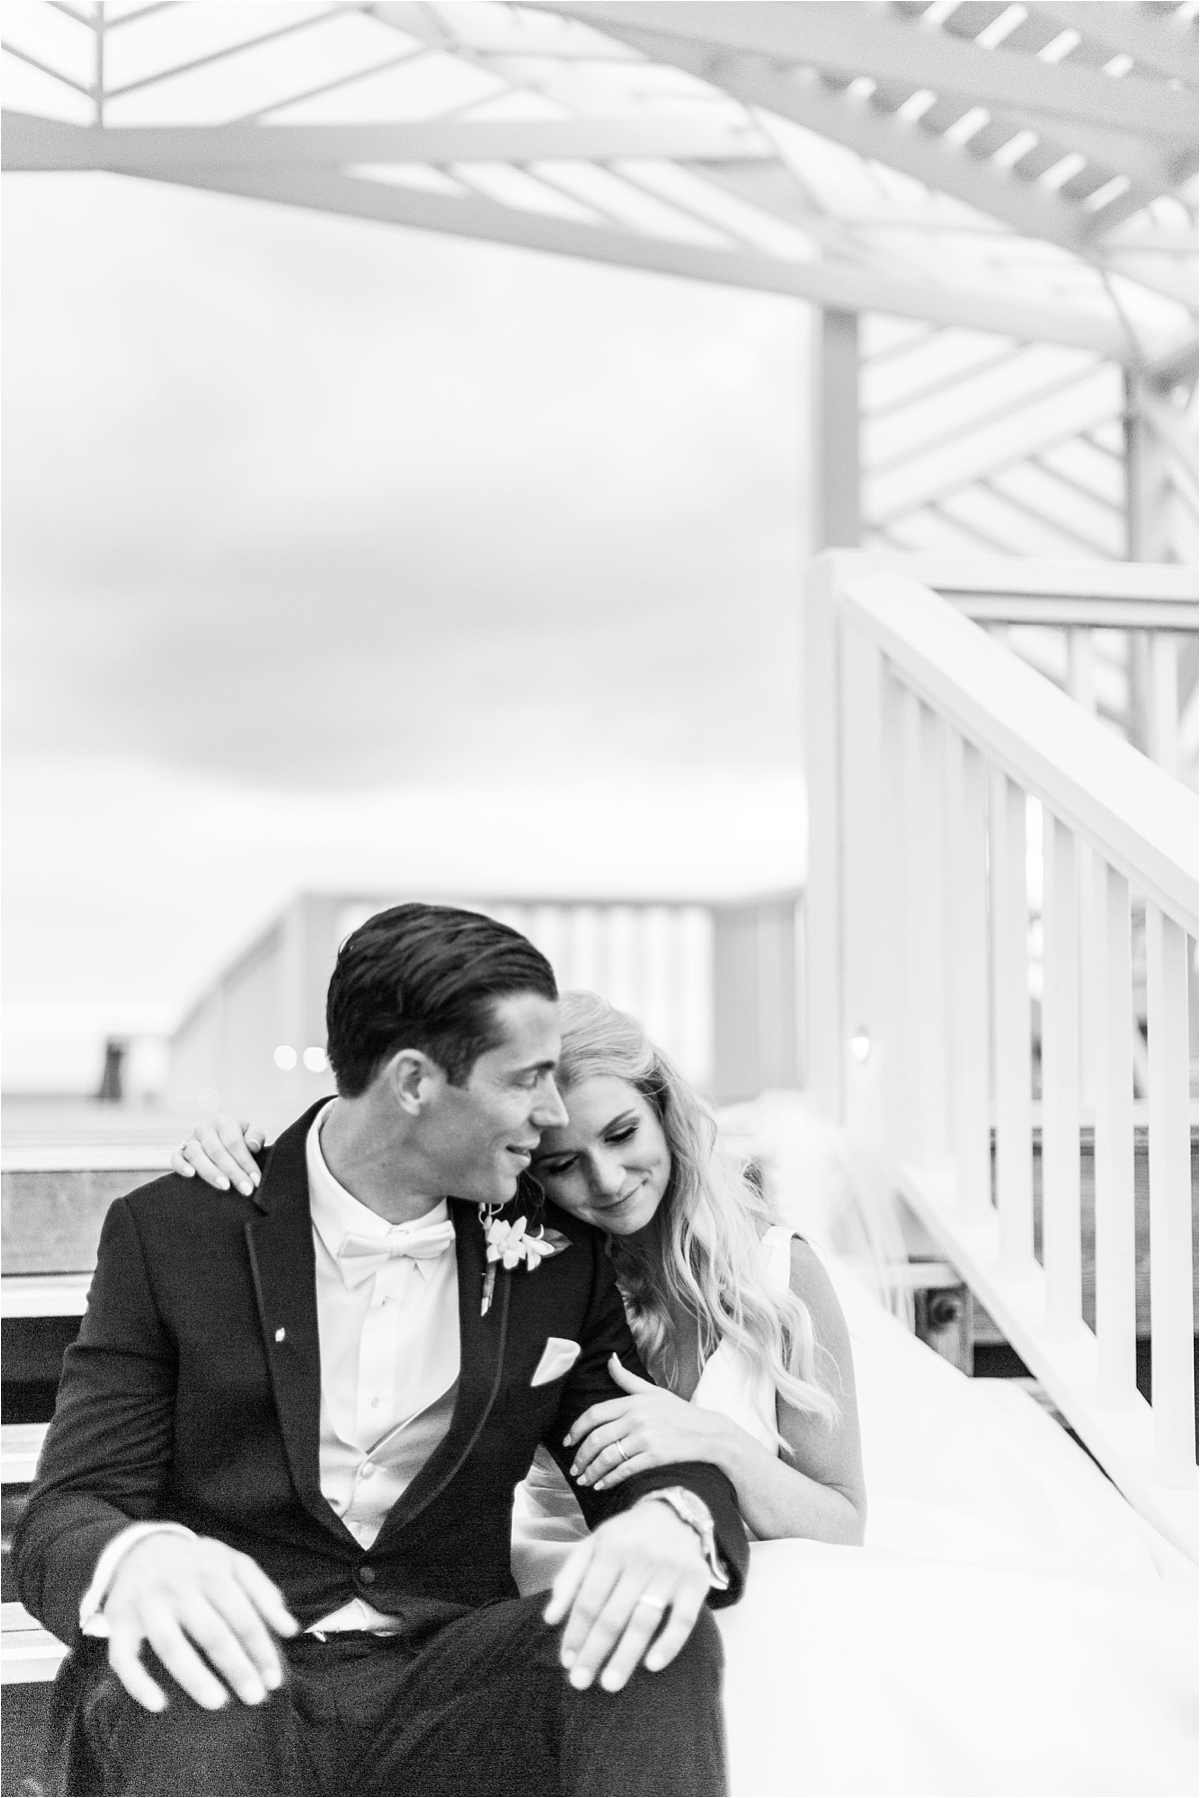 Seaside Florida Wedding Photographer-Catherine Carter + Brian-Alabama photographer-Beach wedding-Bride and Groom-Black and white wedding photographs